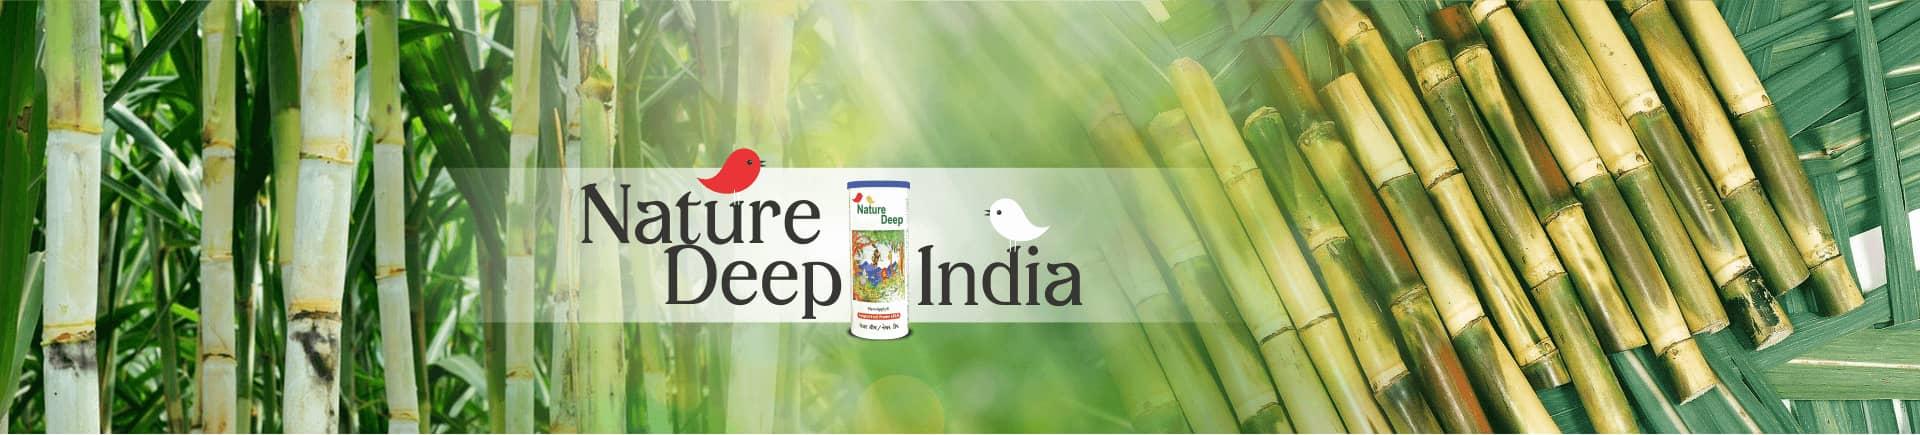 sumitomo naturedeep for sugarcane crop desktop banner